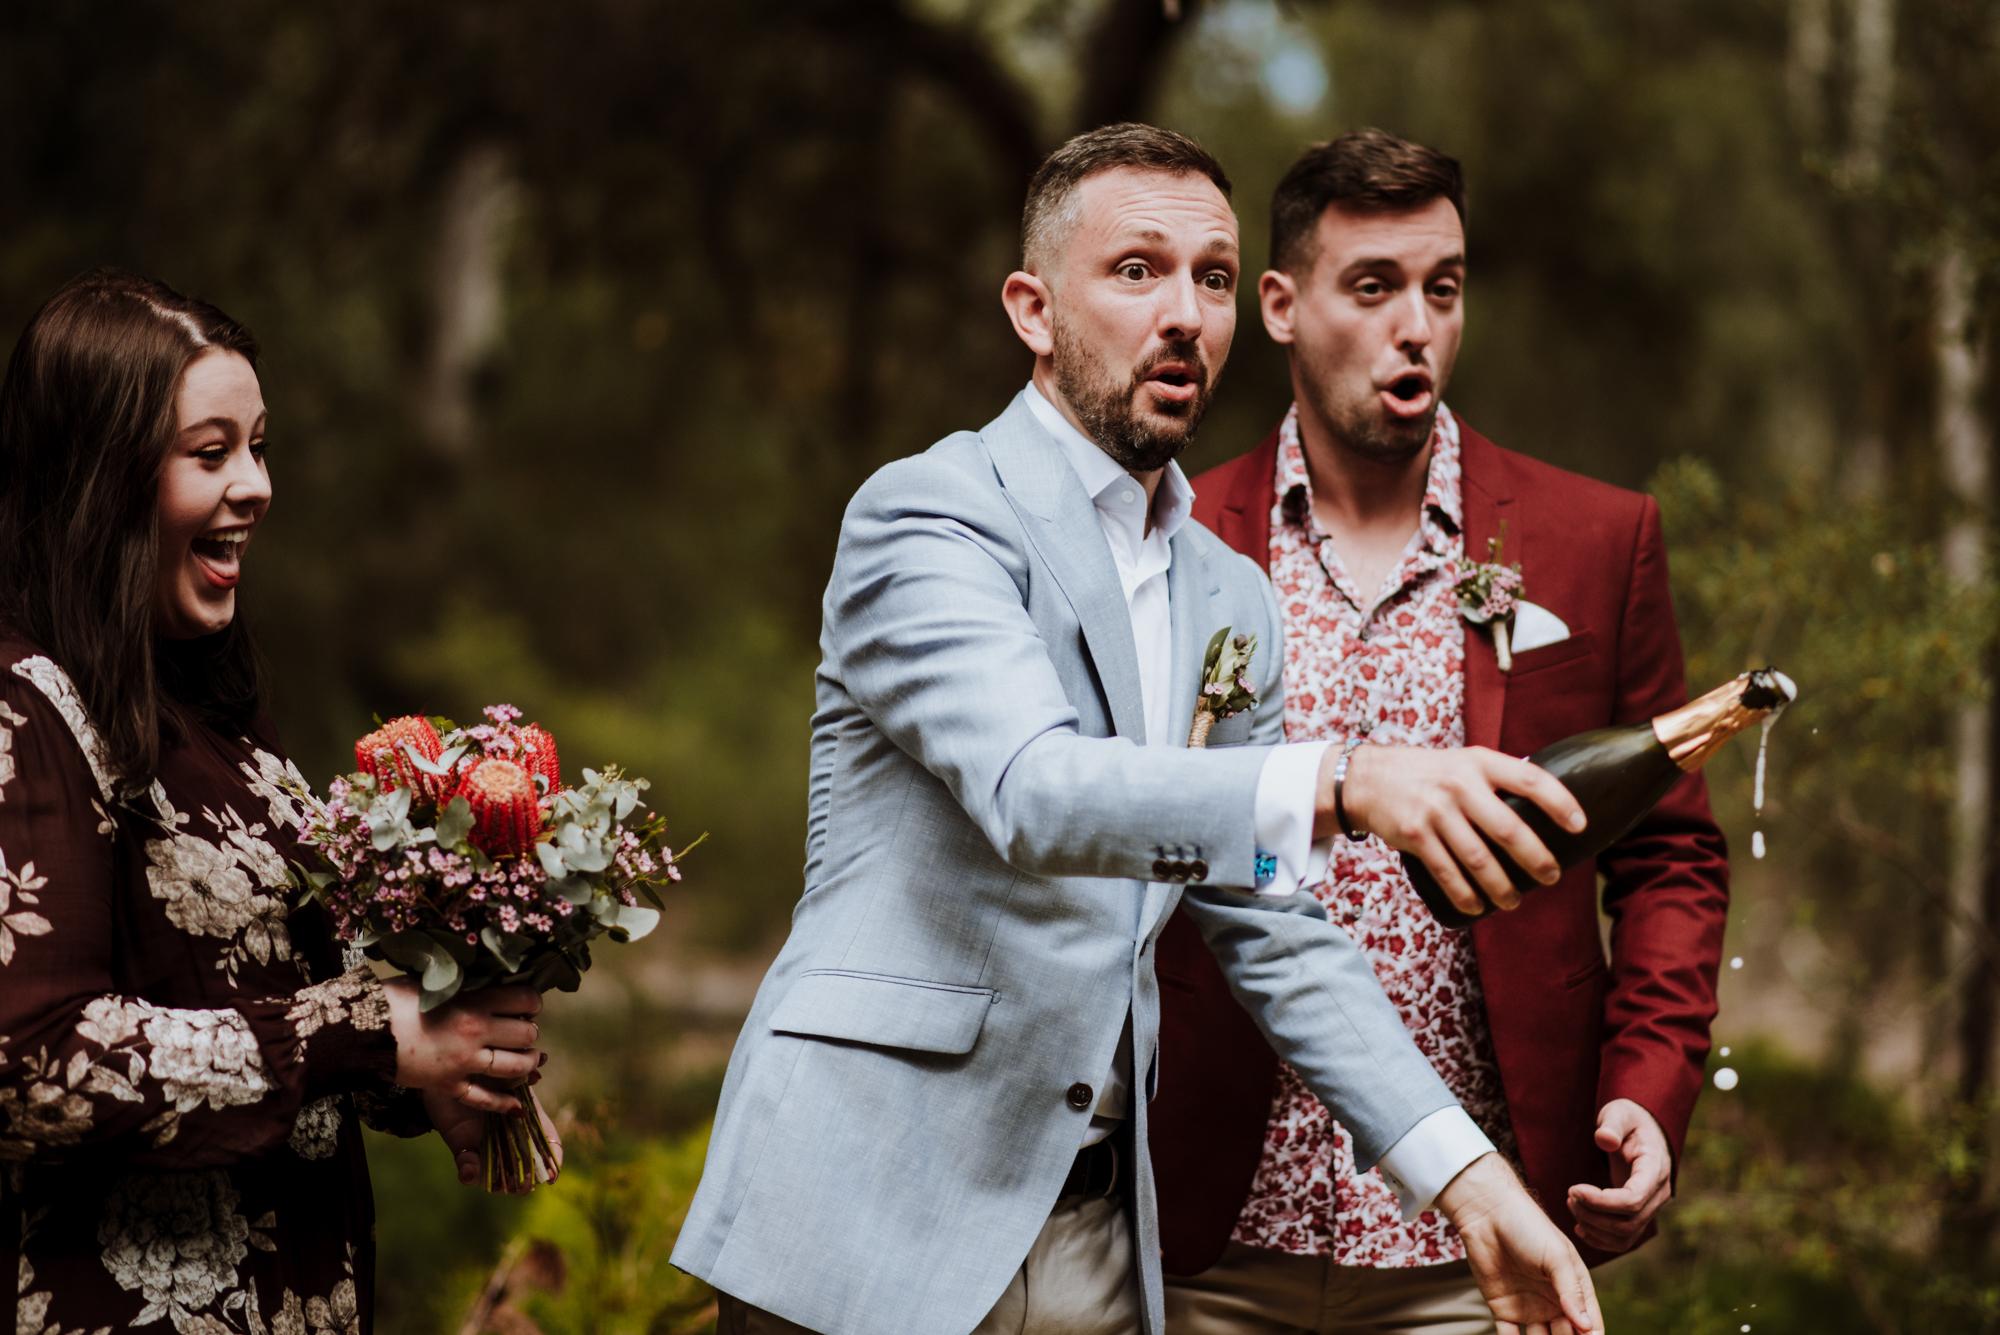 jessica-howard-photography-sean-alessandro-wedding-day-web-143.jpg